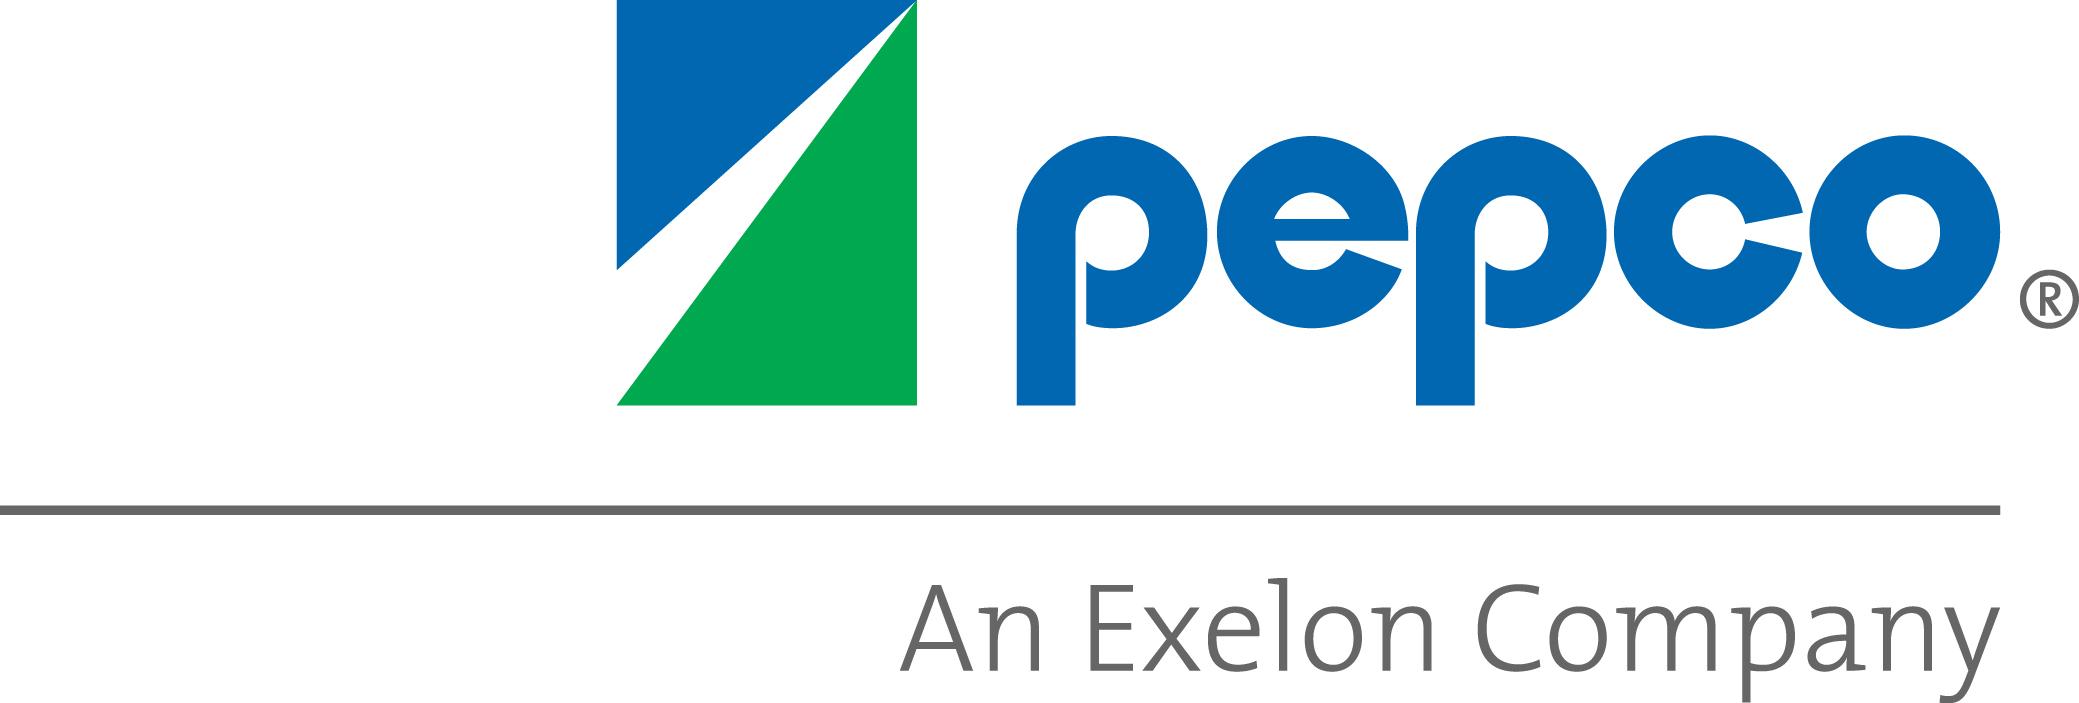 Pepco Brandmark RGB JPG_original.jpg